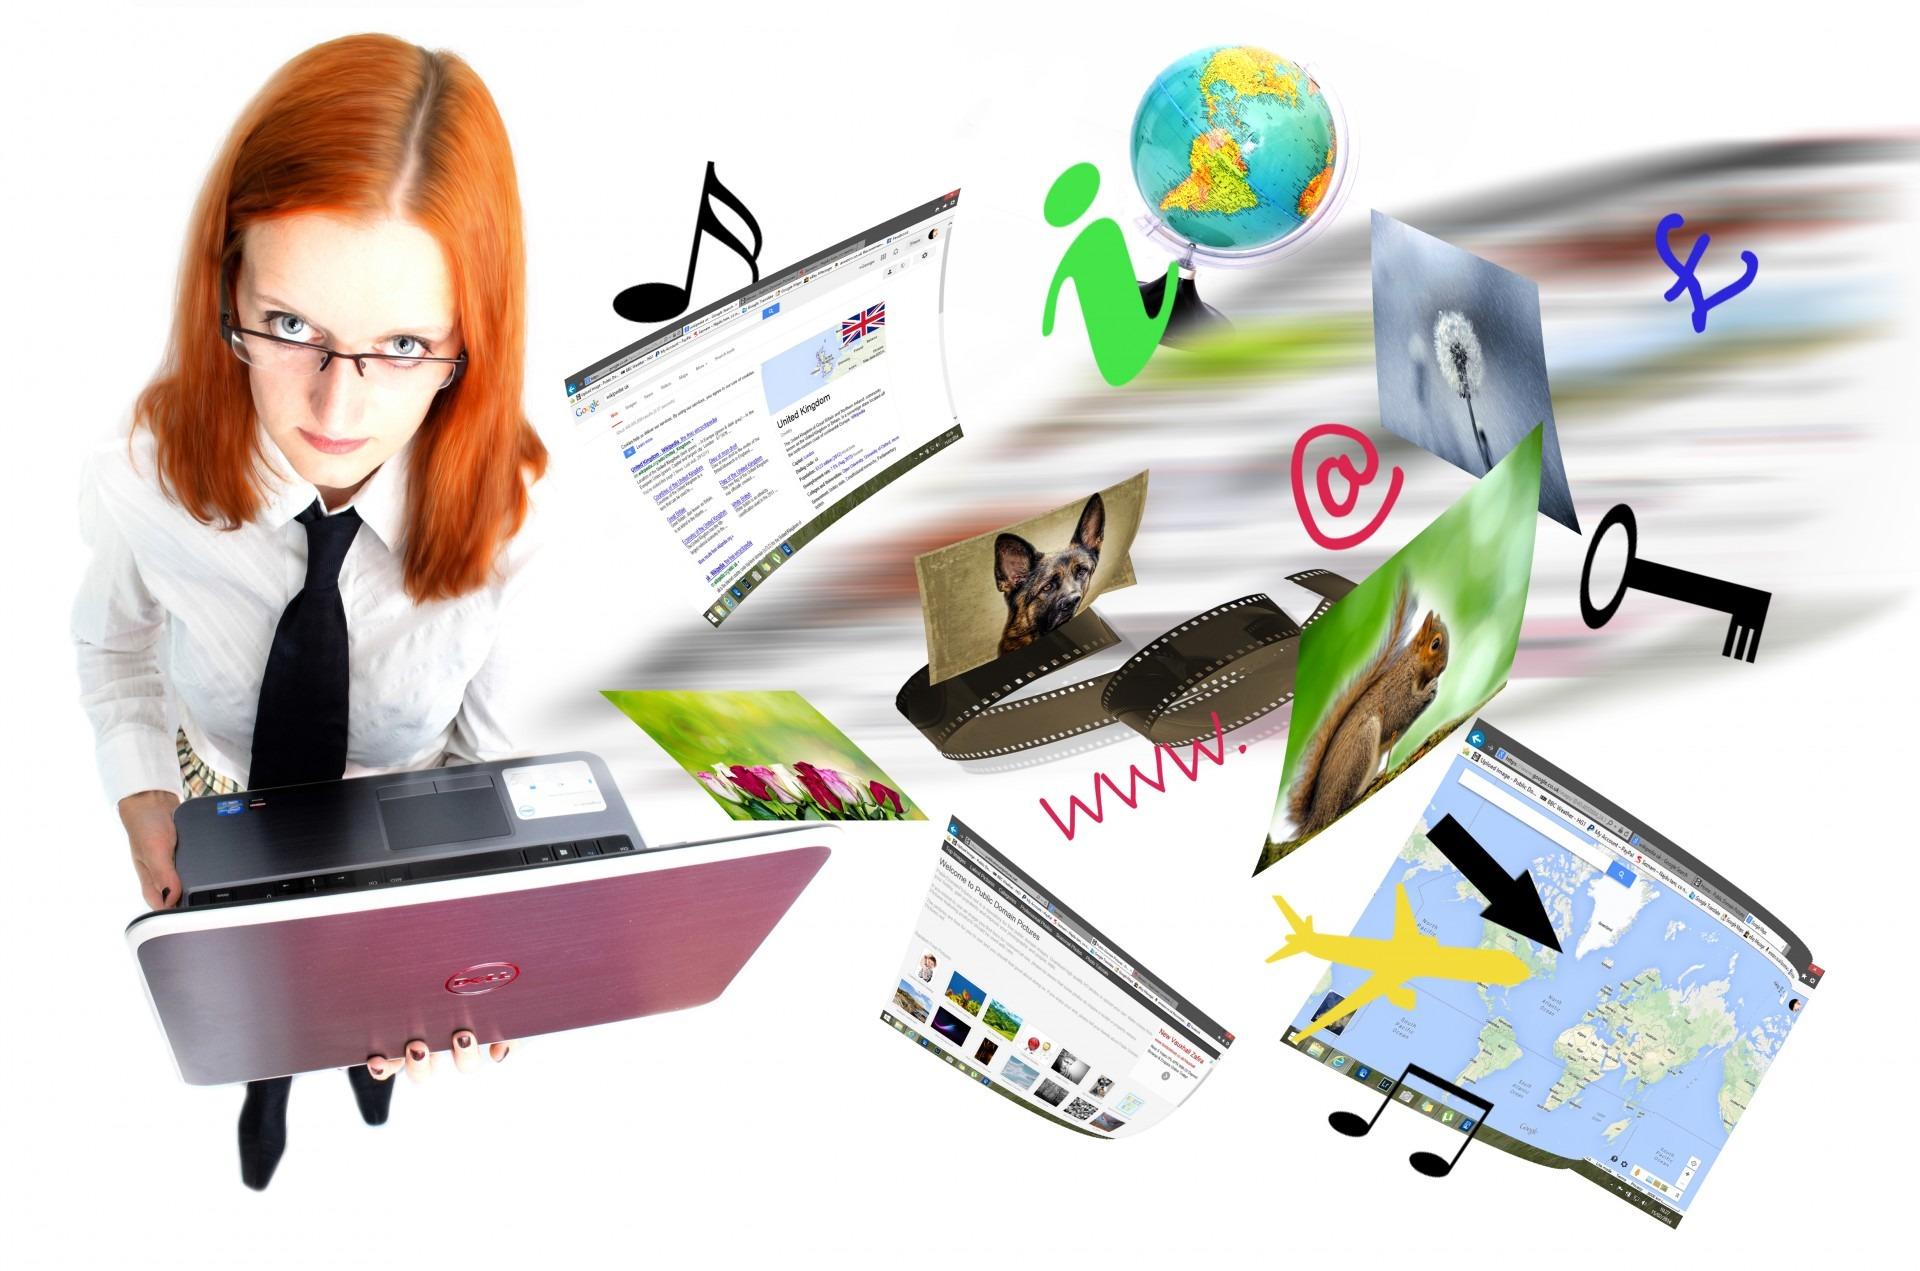 Gambar Laptop Komputer Musik Orang Orang Teknologi Bangunan